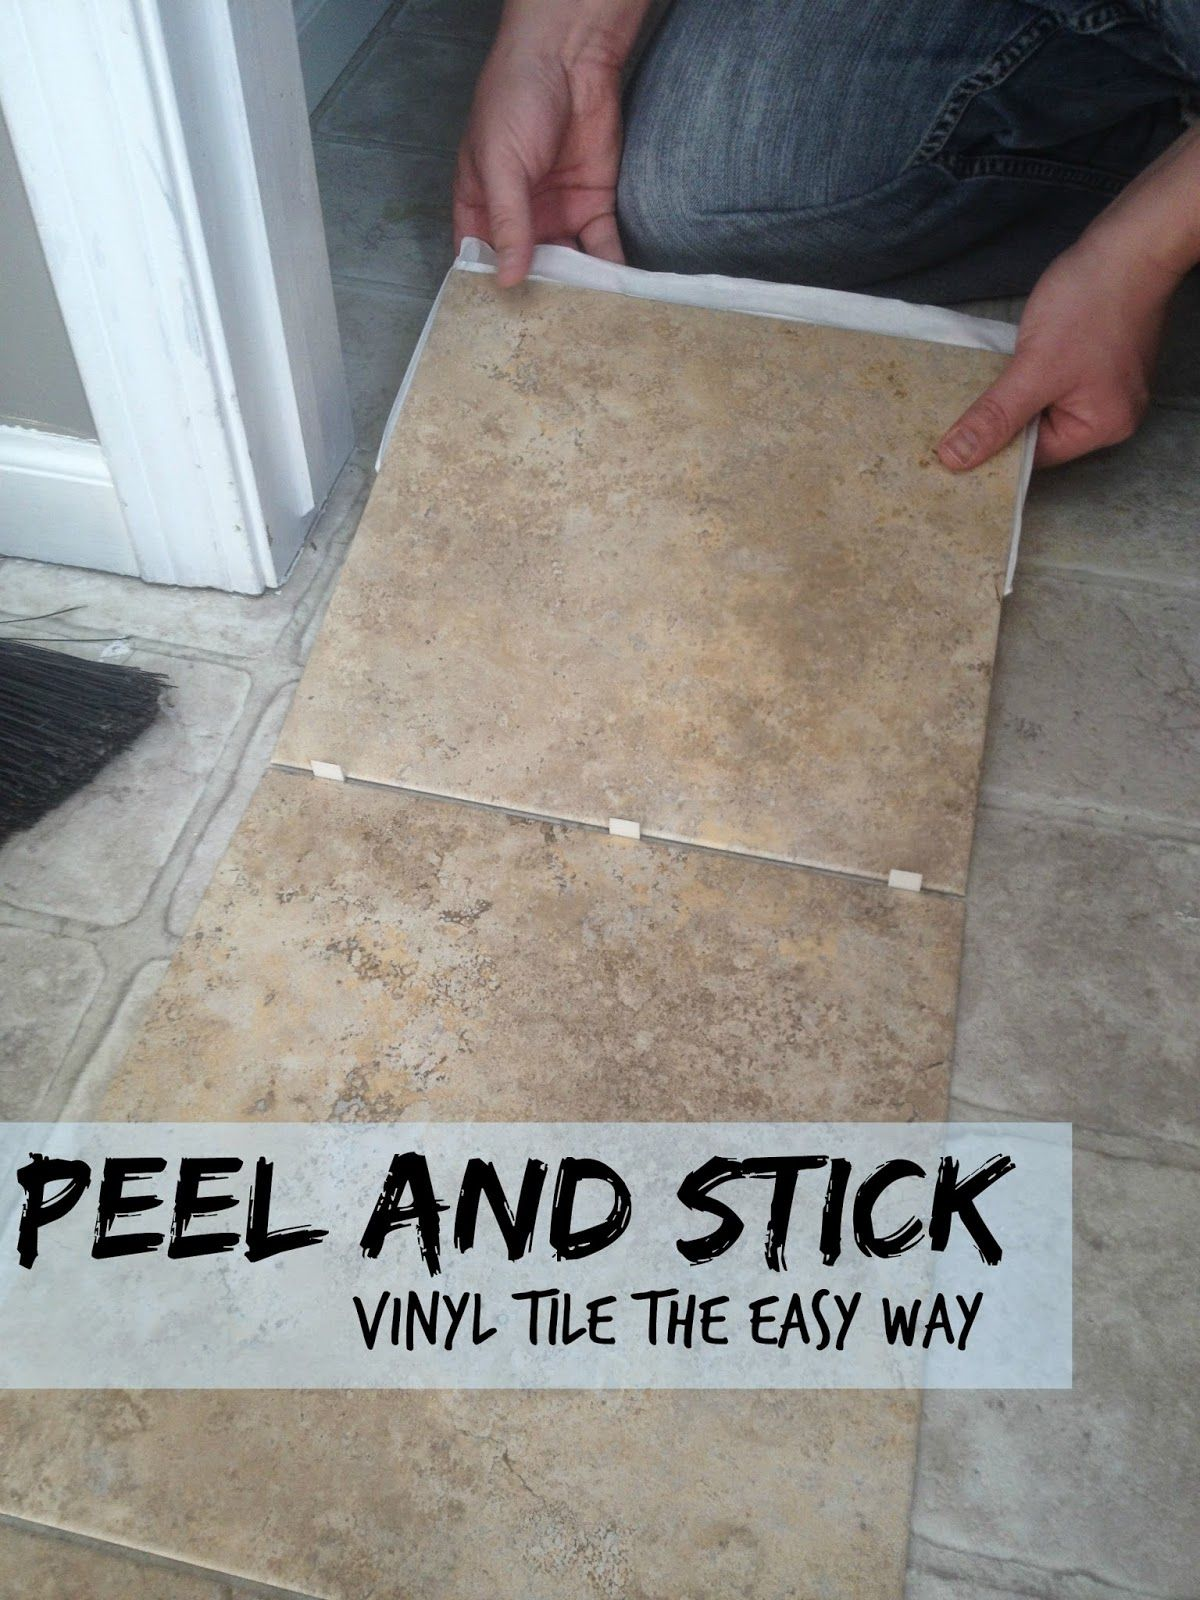 Peel and Stick Vinyl Tile | Tile floor diy. Stick on vinyl tiles